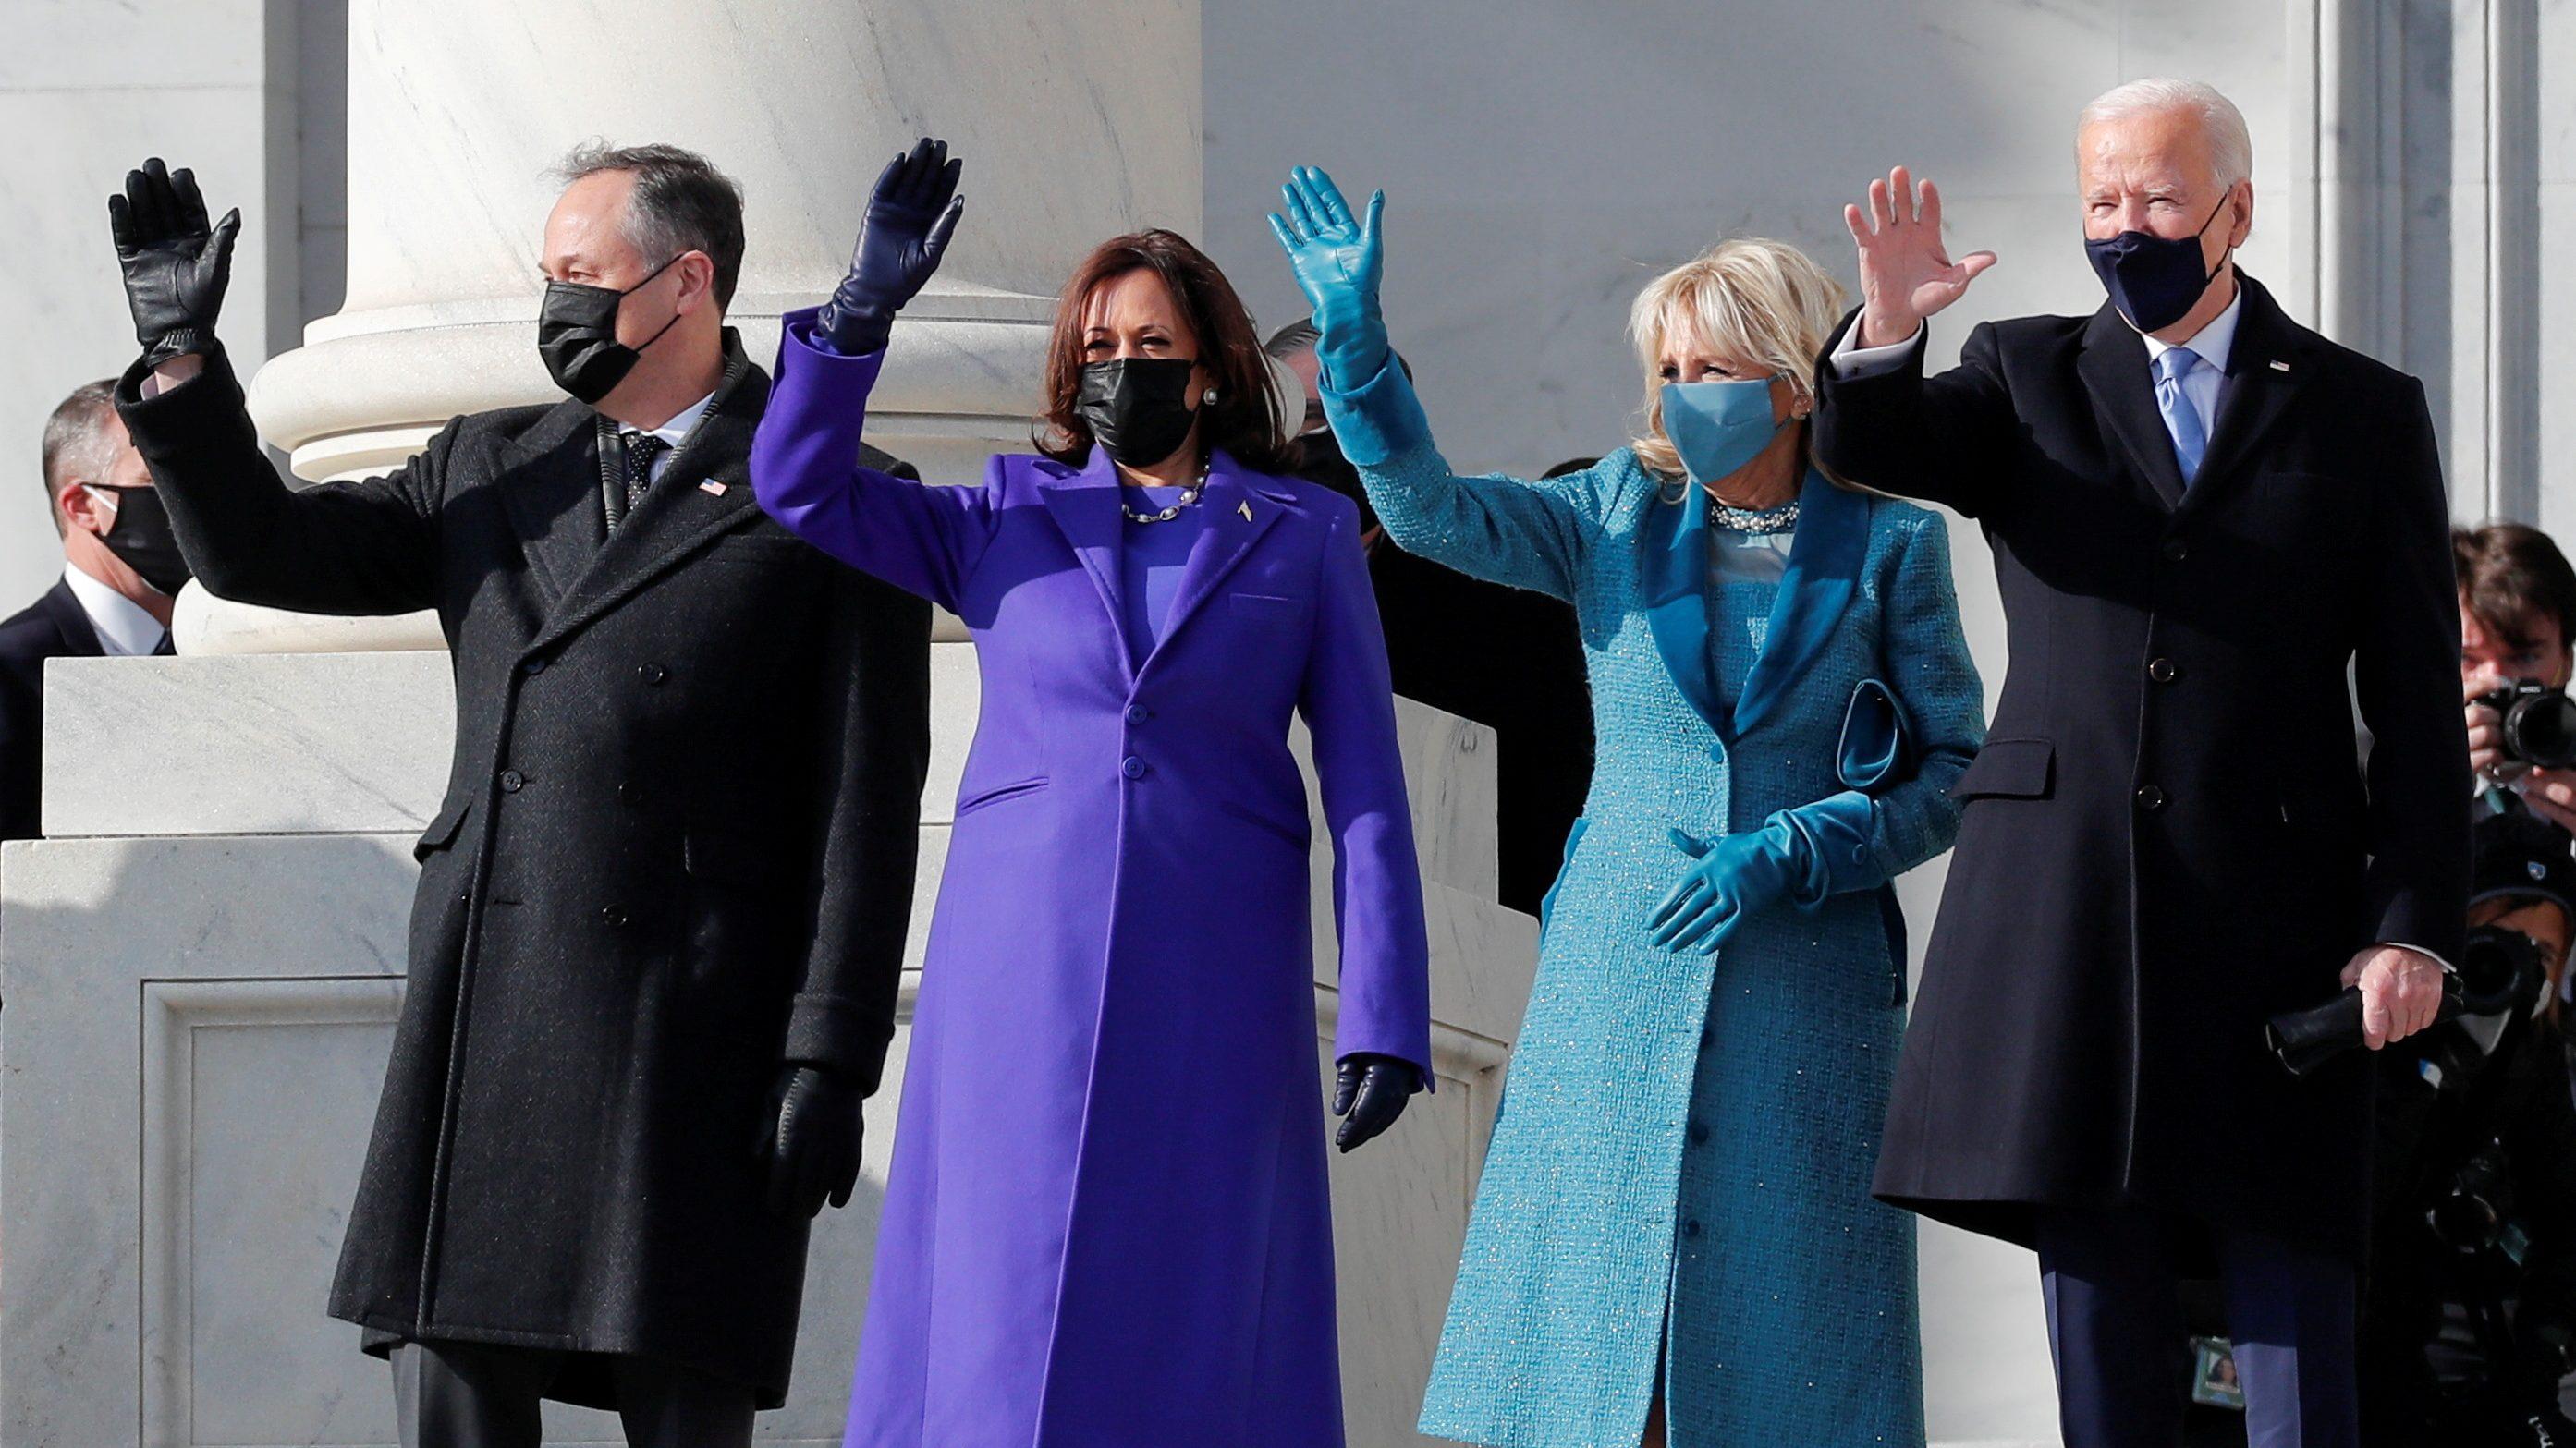 President-elect Joe Biden, his wife Jill Biden, Vice President-elect Kamala Harris and her husband Doug Emhoff salute as they arrive ahead of the inauguration in Washington